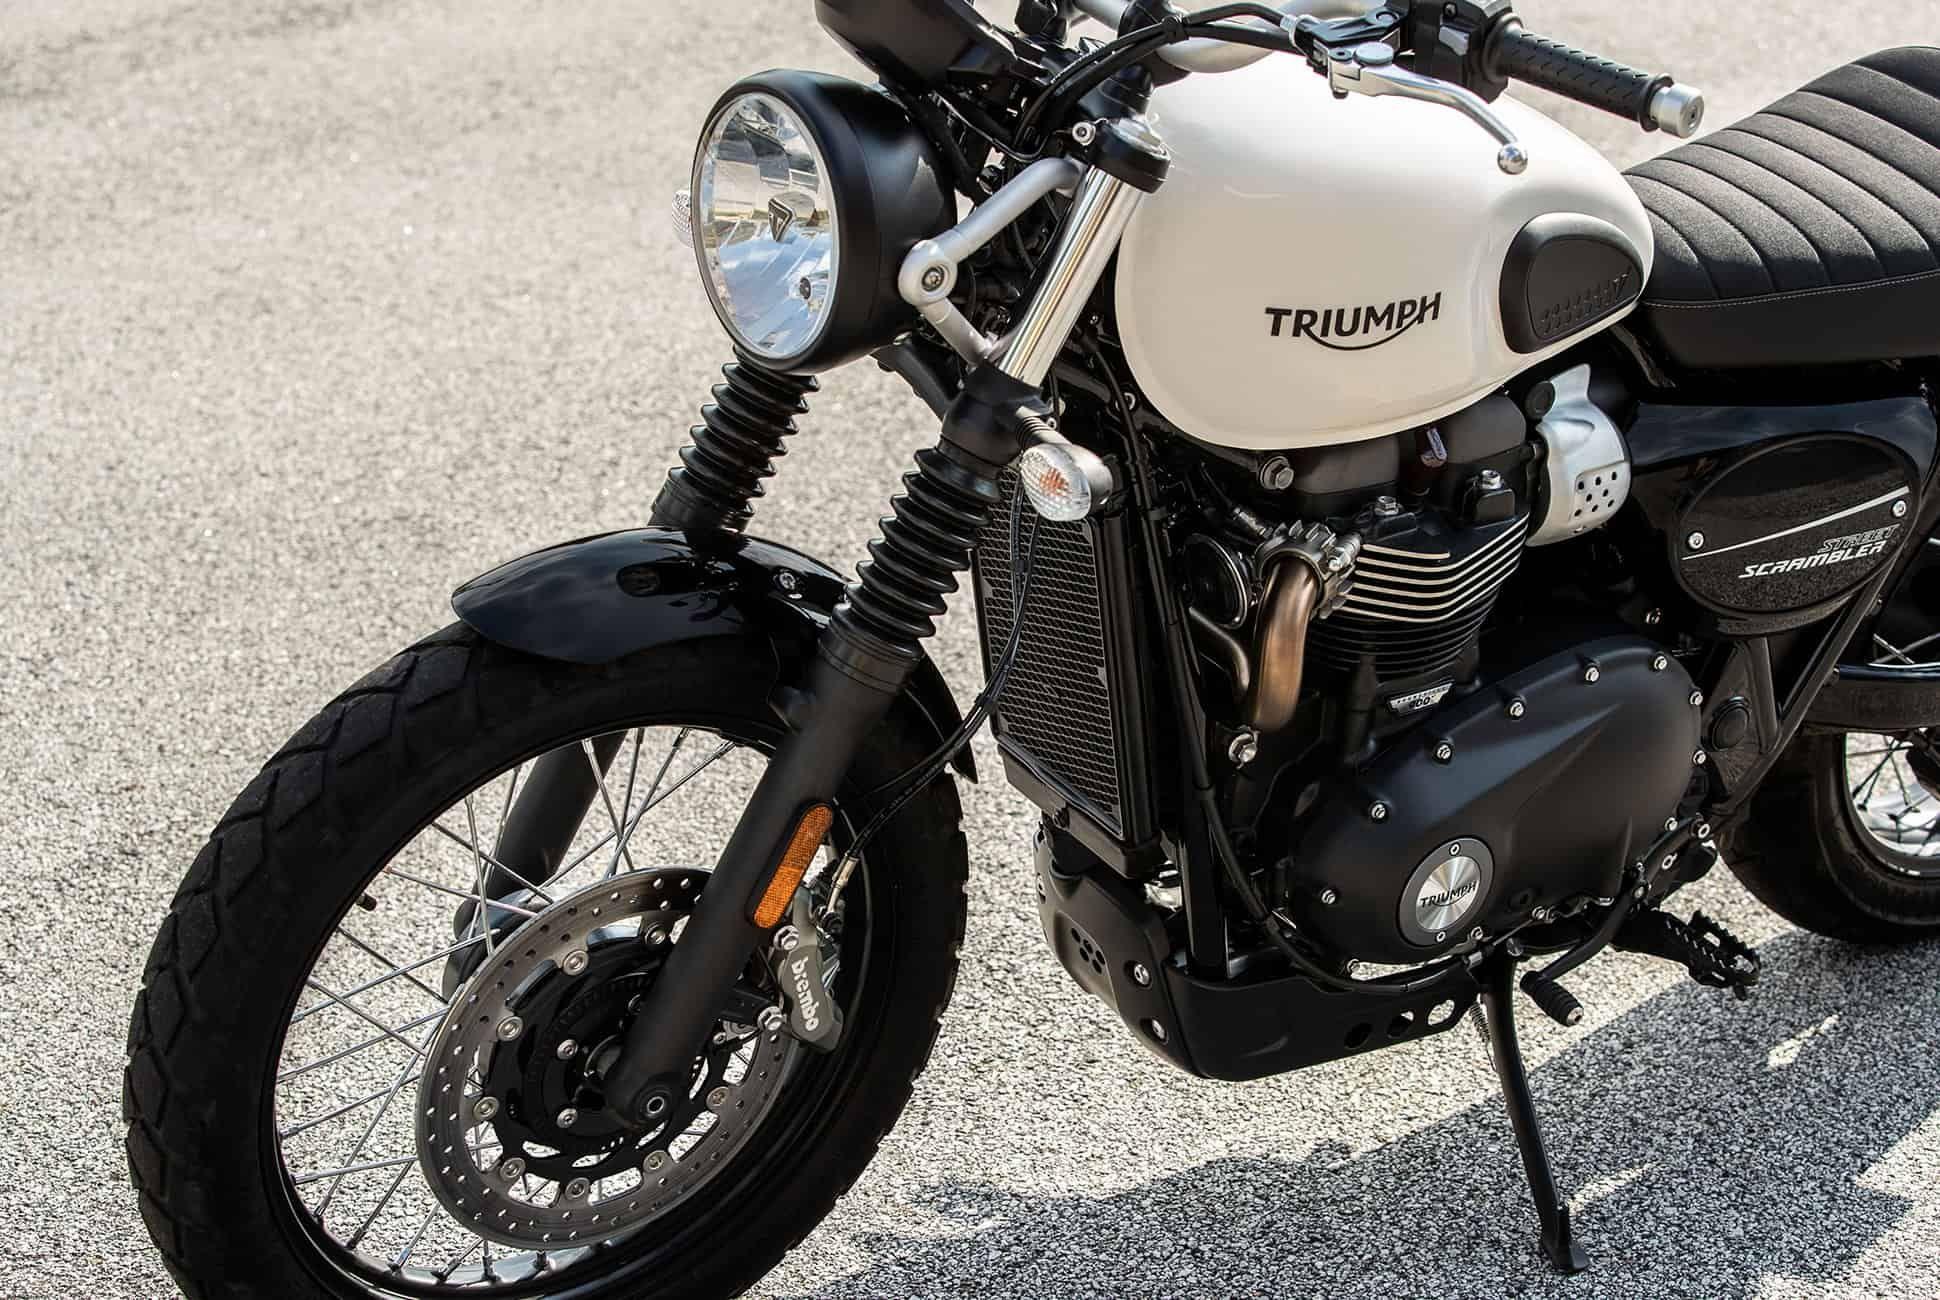 2019-Triumph-Street-Scrambler-gear-patrol-slide-7